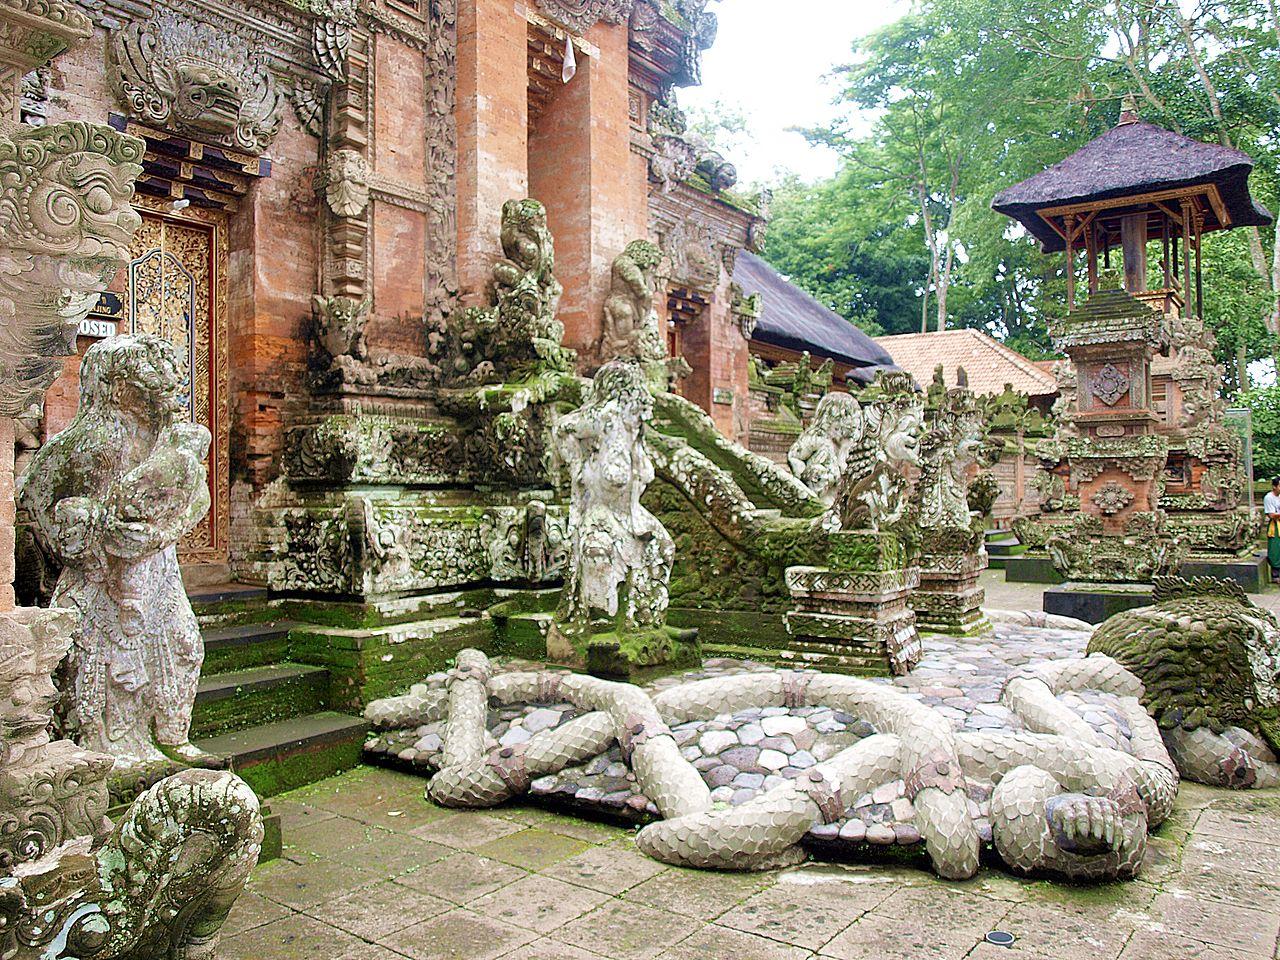 Лес обезьян, скульптуры в храме